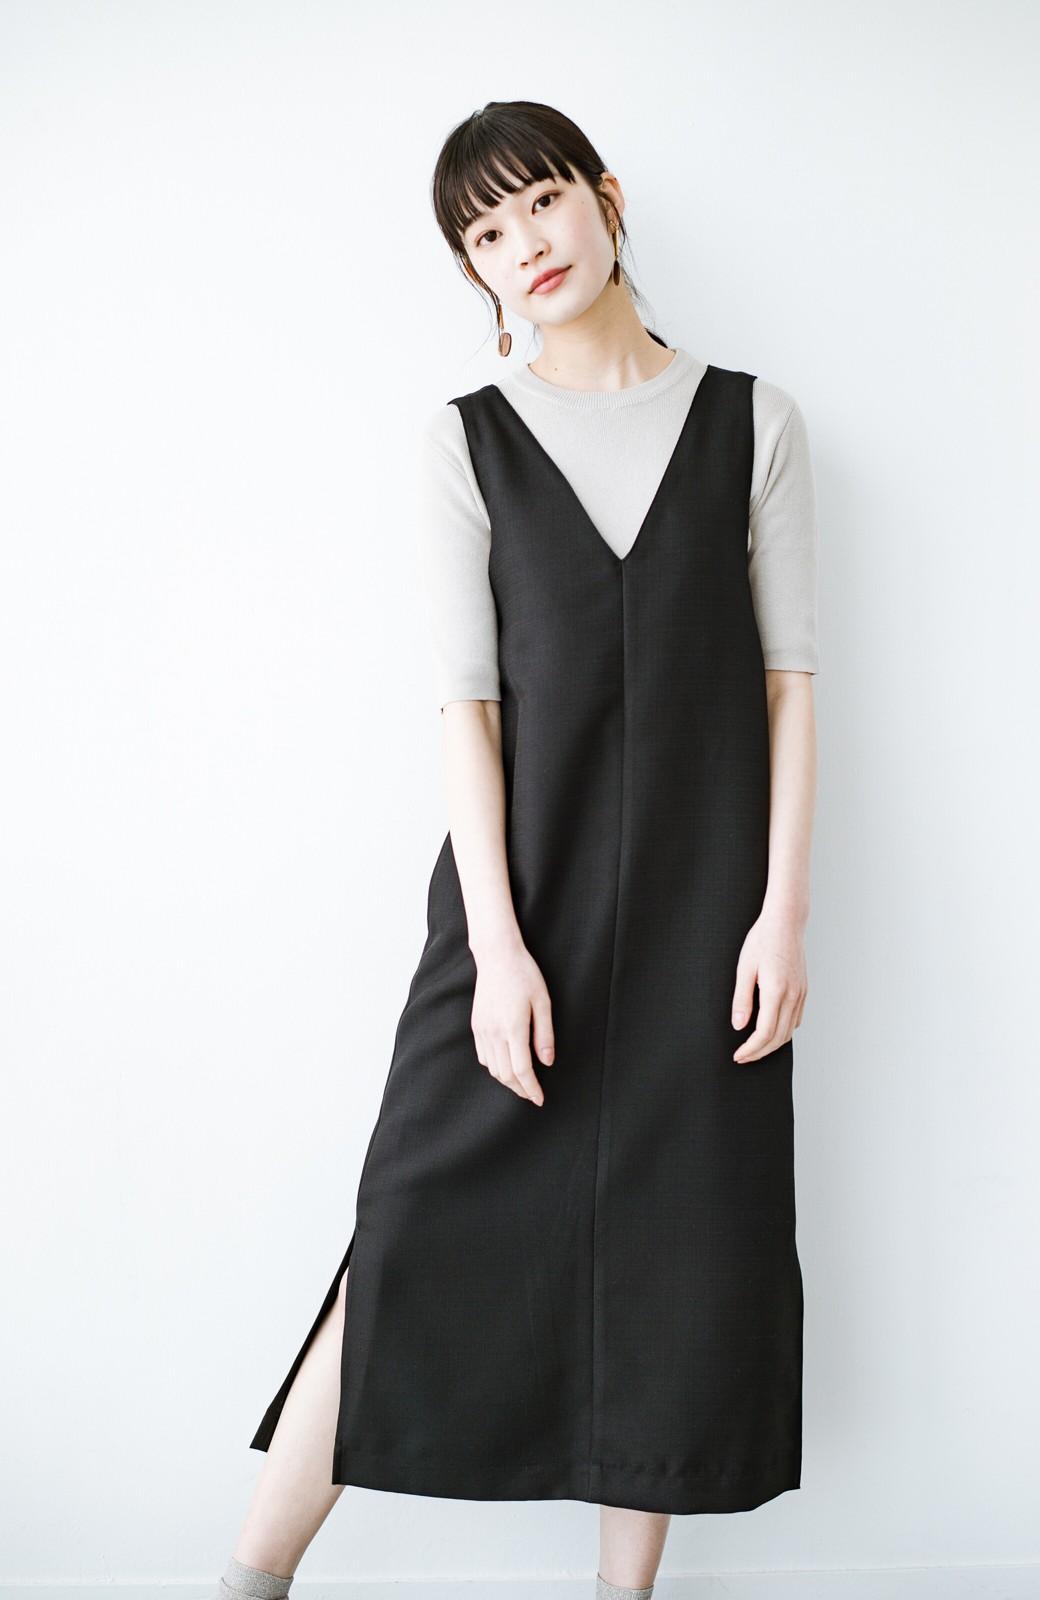 haco! 何てことないTシャツと重ねるだけでパッとかわいくなれる 魔法のようなジャンパースカート <ブラック>の商品写真14